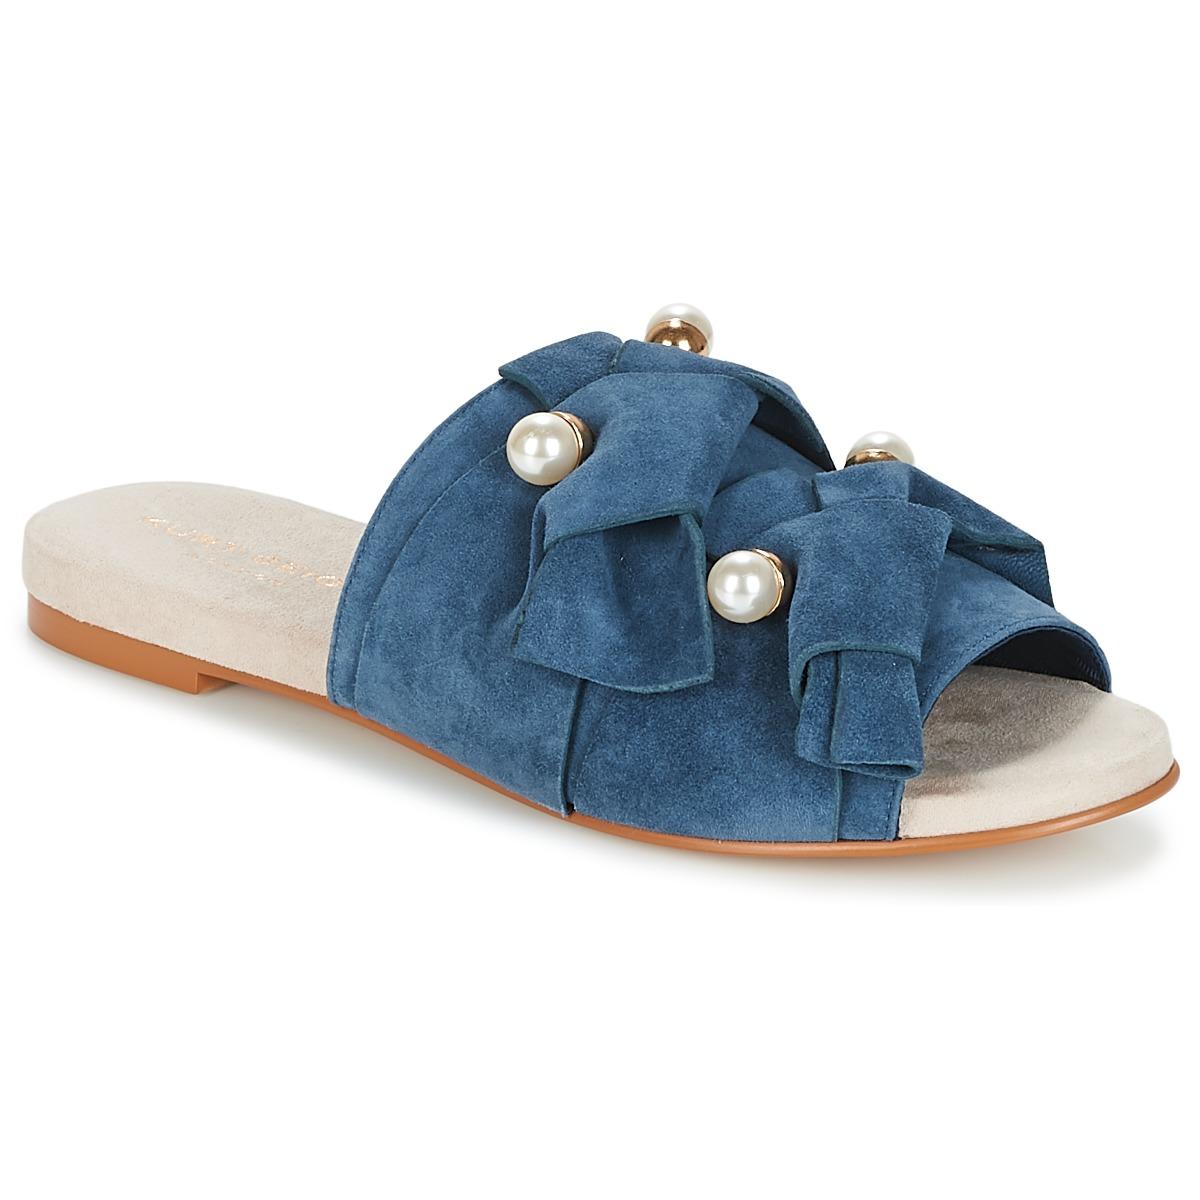 KG by Kurt Geiger NAOMI-BLUE Blau - Kostenloser Versand bei Spartoode ! - Schuhe Pantoffel Damen 73,80 €